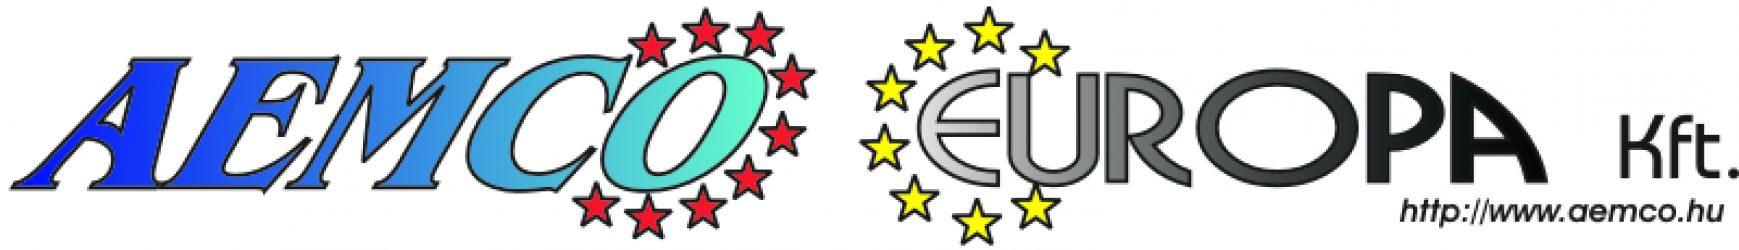 AEMCO EUROPA LTD